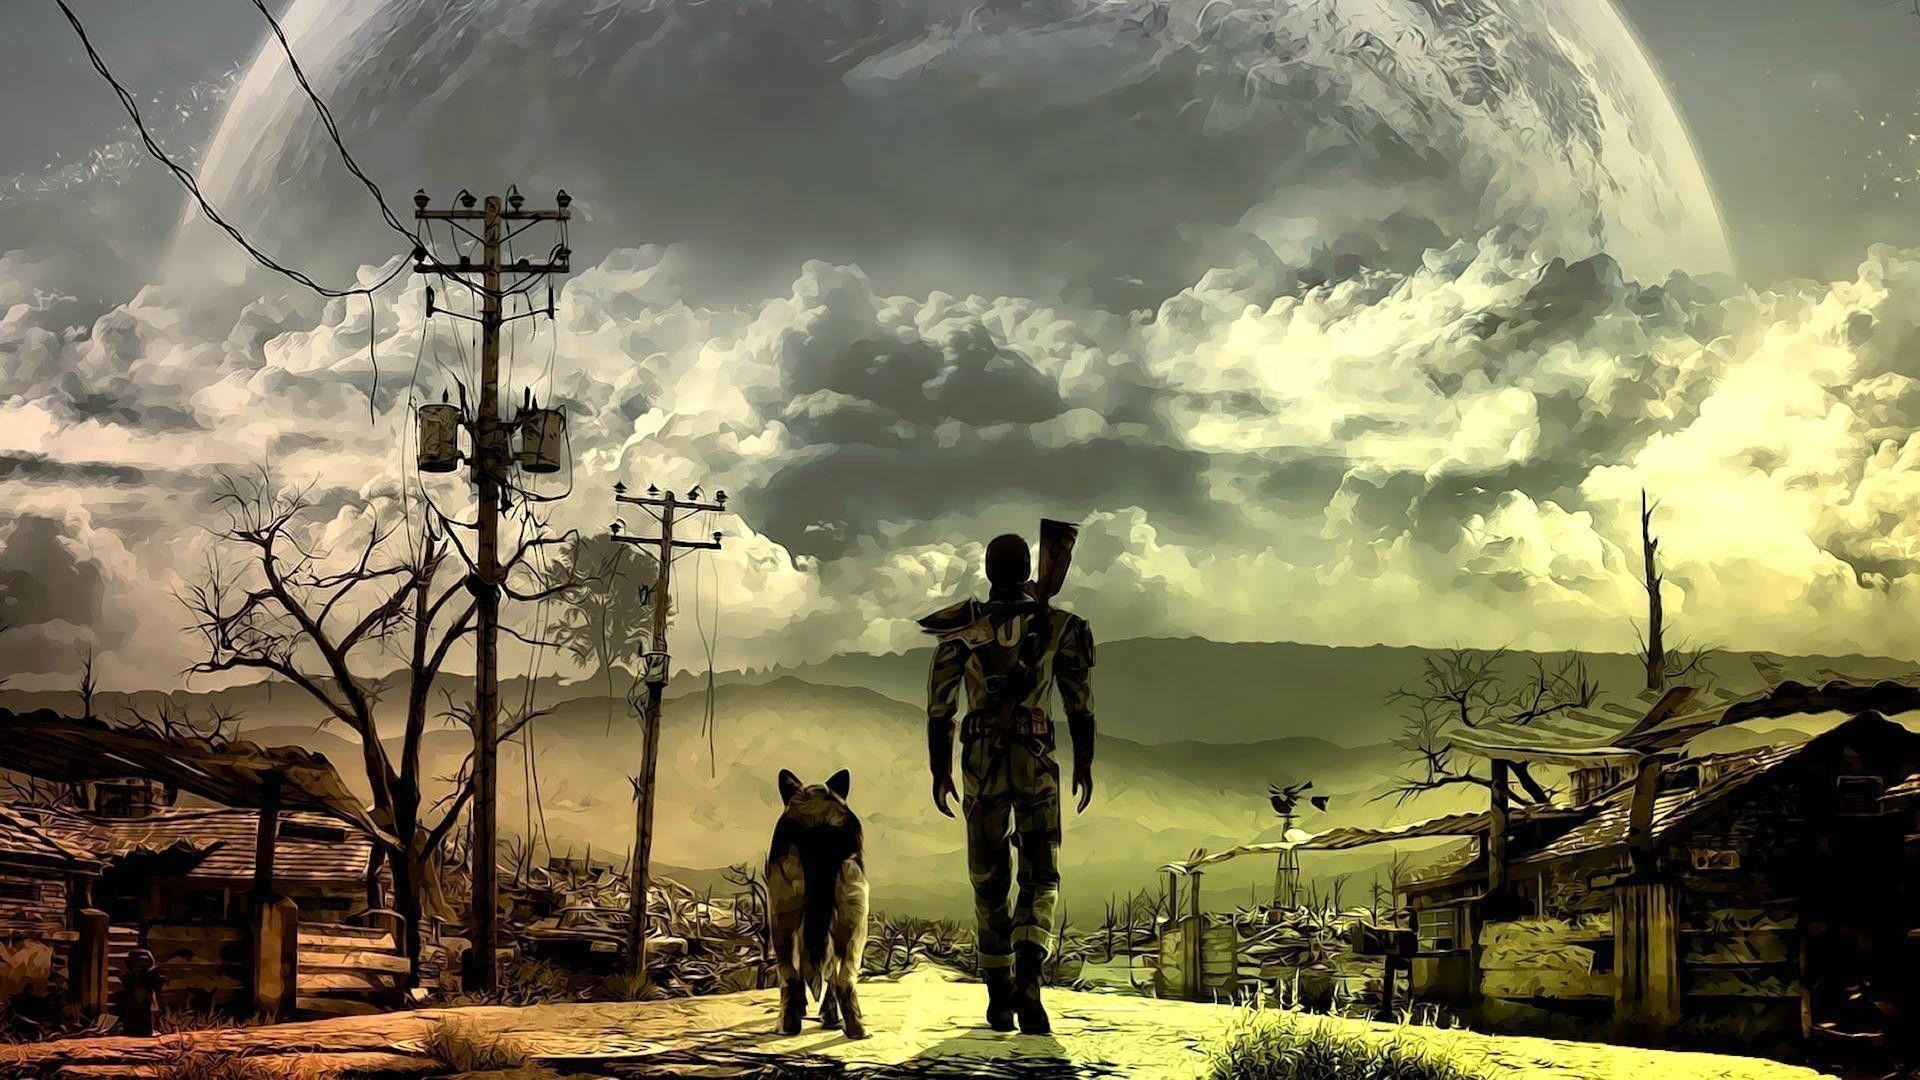 fallout 3 desktop backgrounds - wallpaper cave